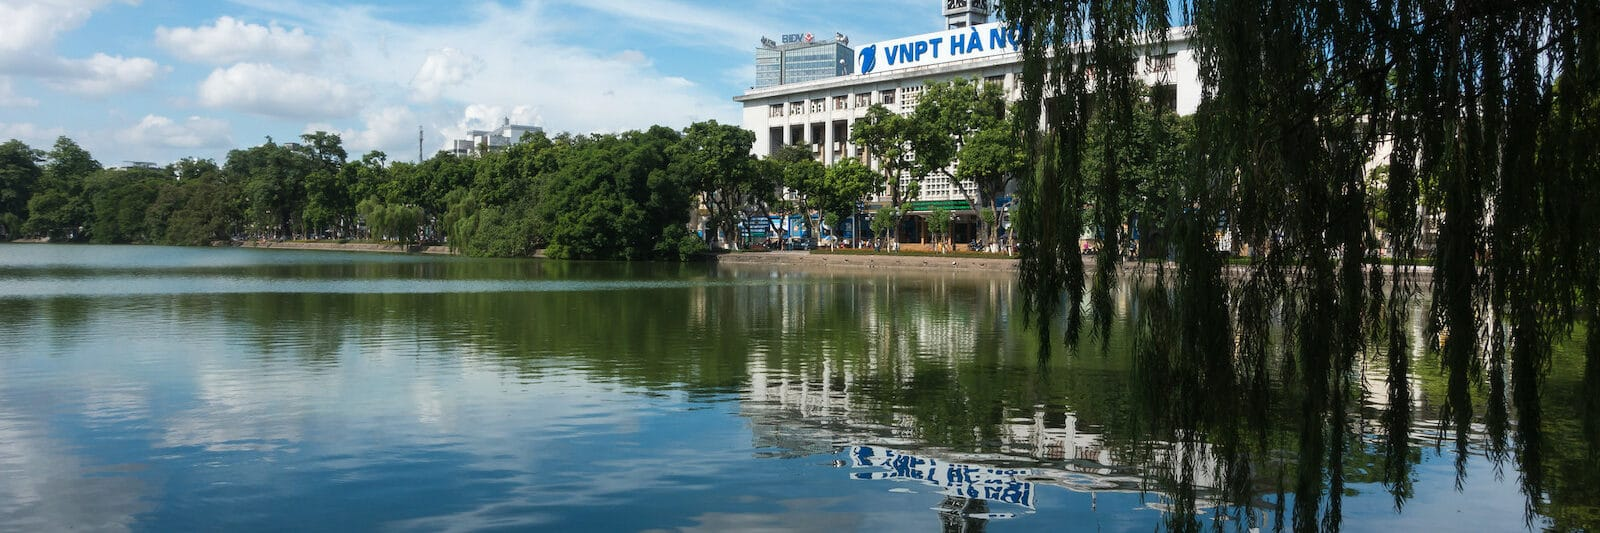 Image of the post office reflecting on Hoan Kiem Lake in Hanoi, Vietnam